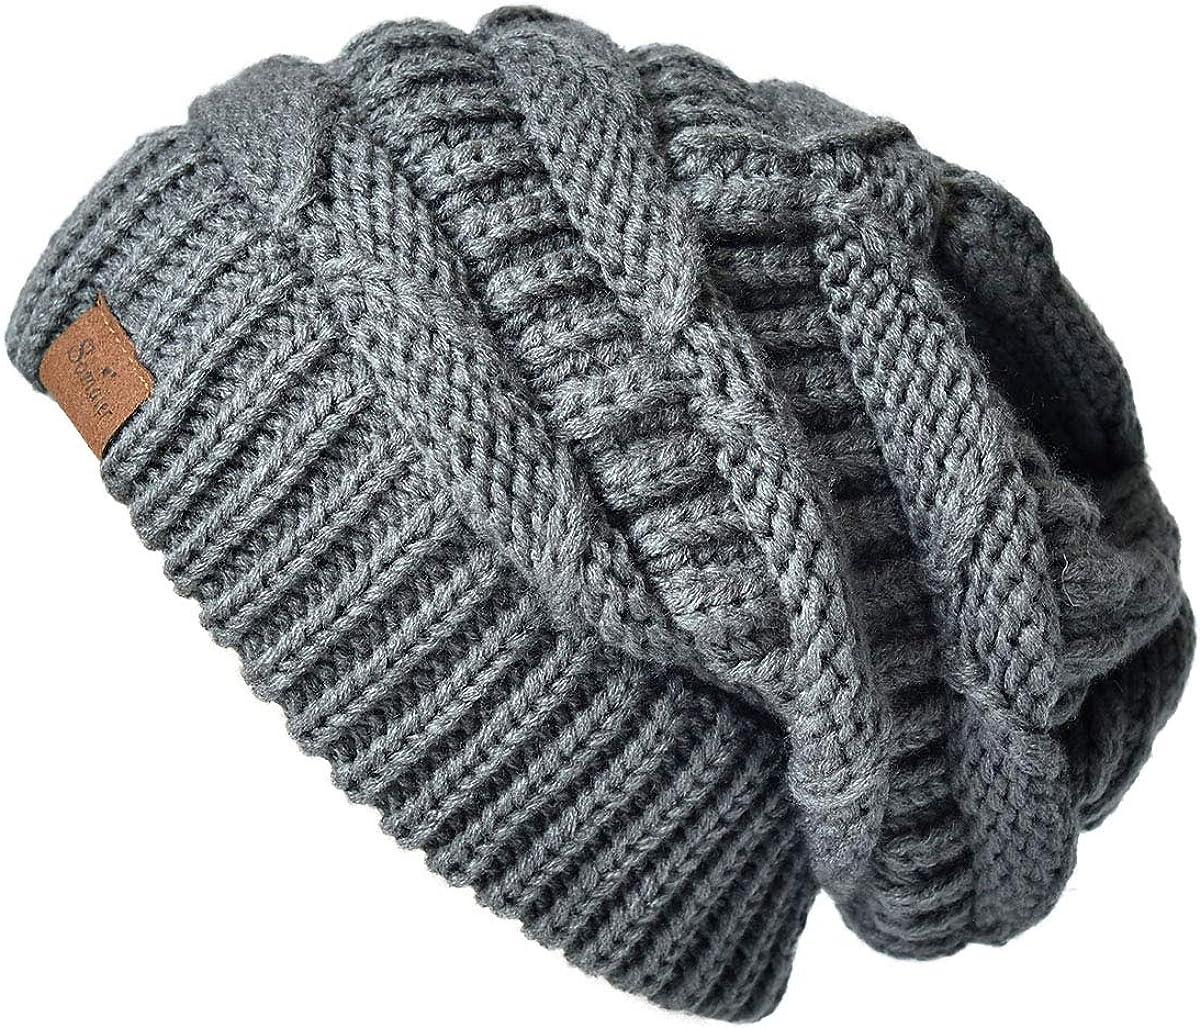 ENJOYFUR Womens Knit Slouchy Beanie Hat,Trendy Chunky Cable Knit Beanie,Oversized Winter Hats for Women